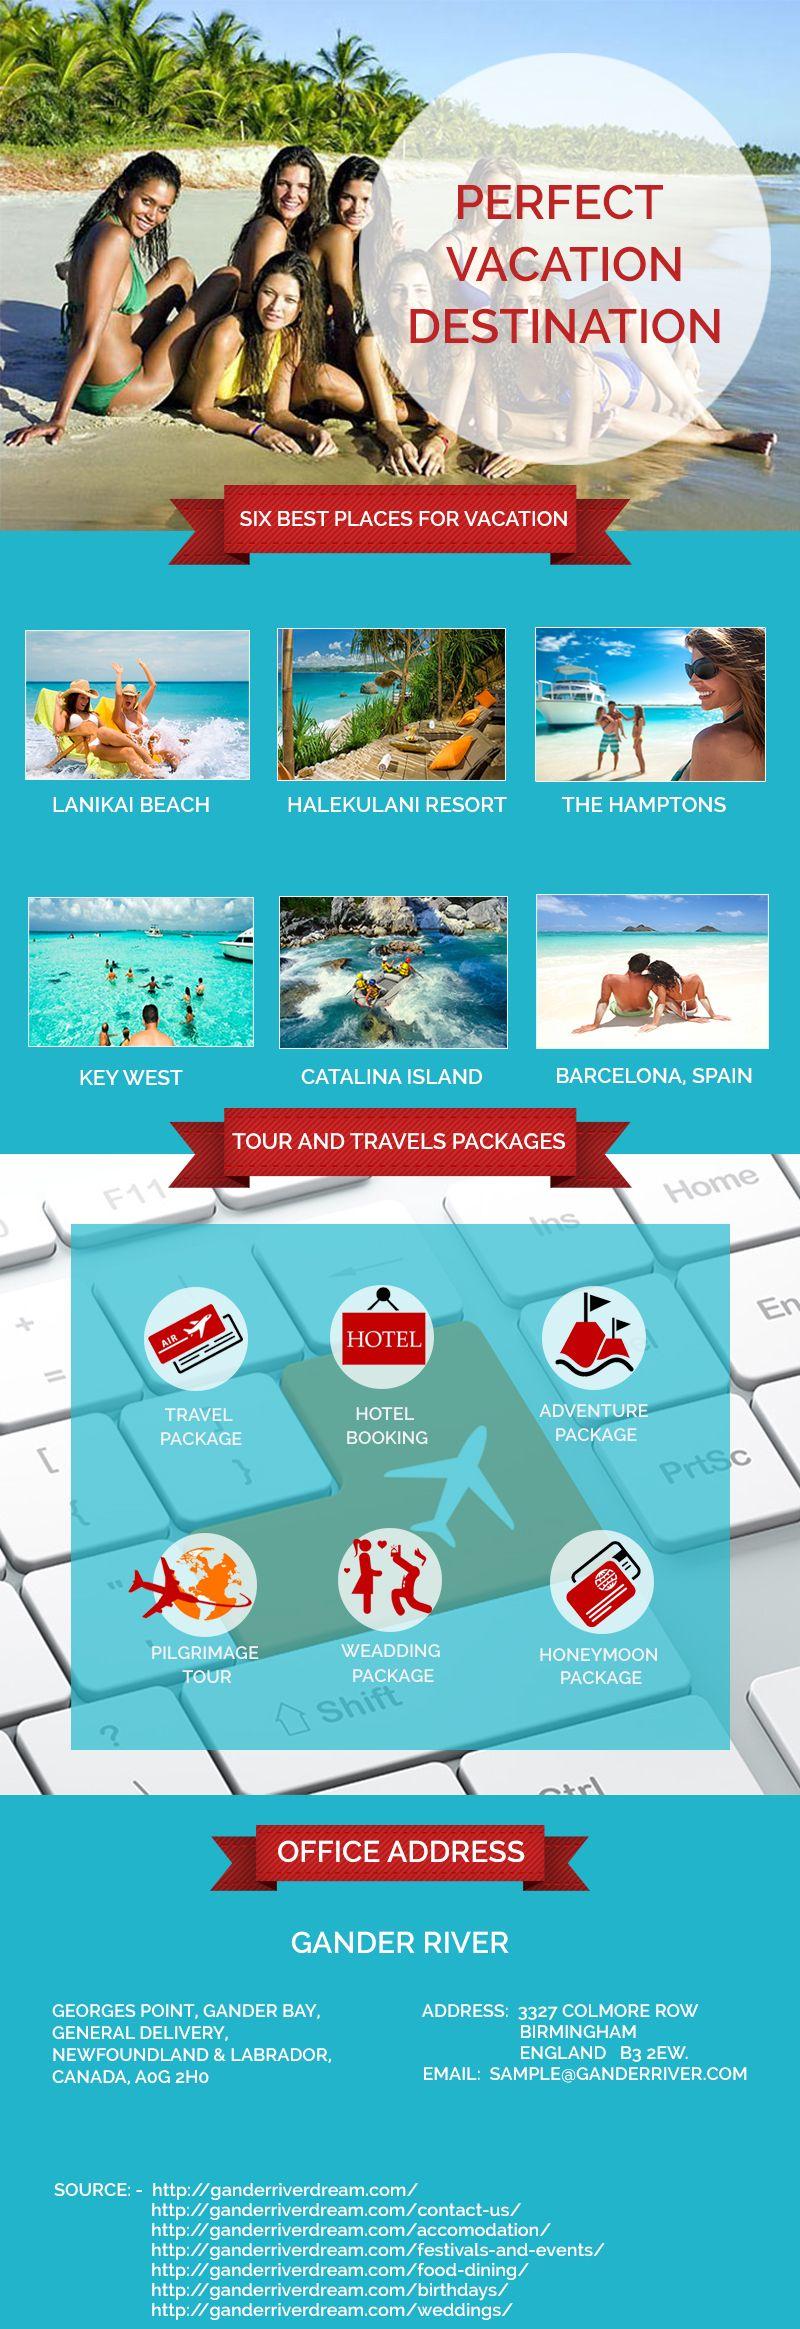 www.GanderRiverDream.com  Arrange Events ,Adventure trip,camps,etc